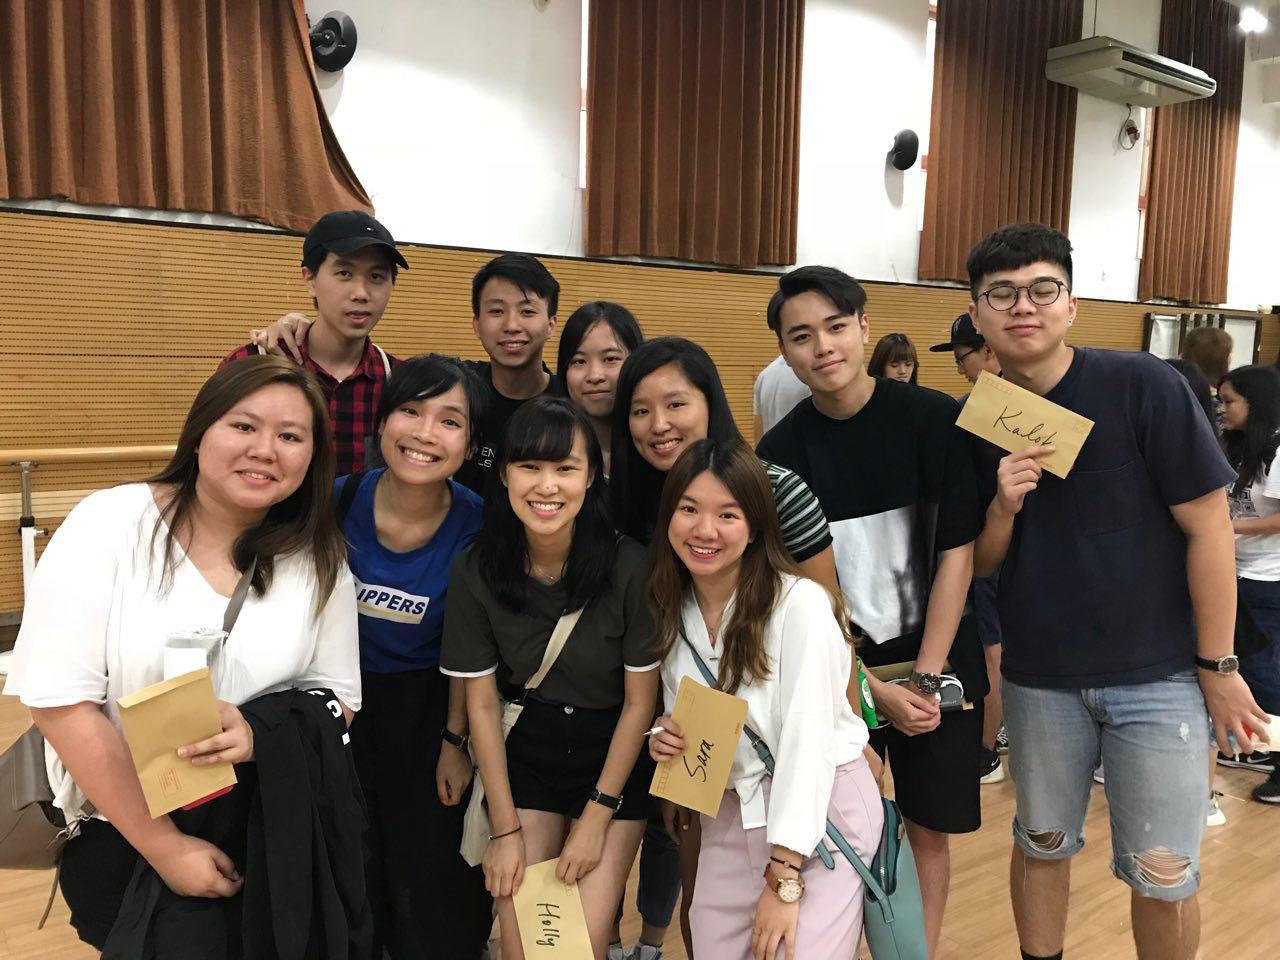 photo_2018-07-26_22-13-19.jpg